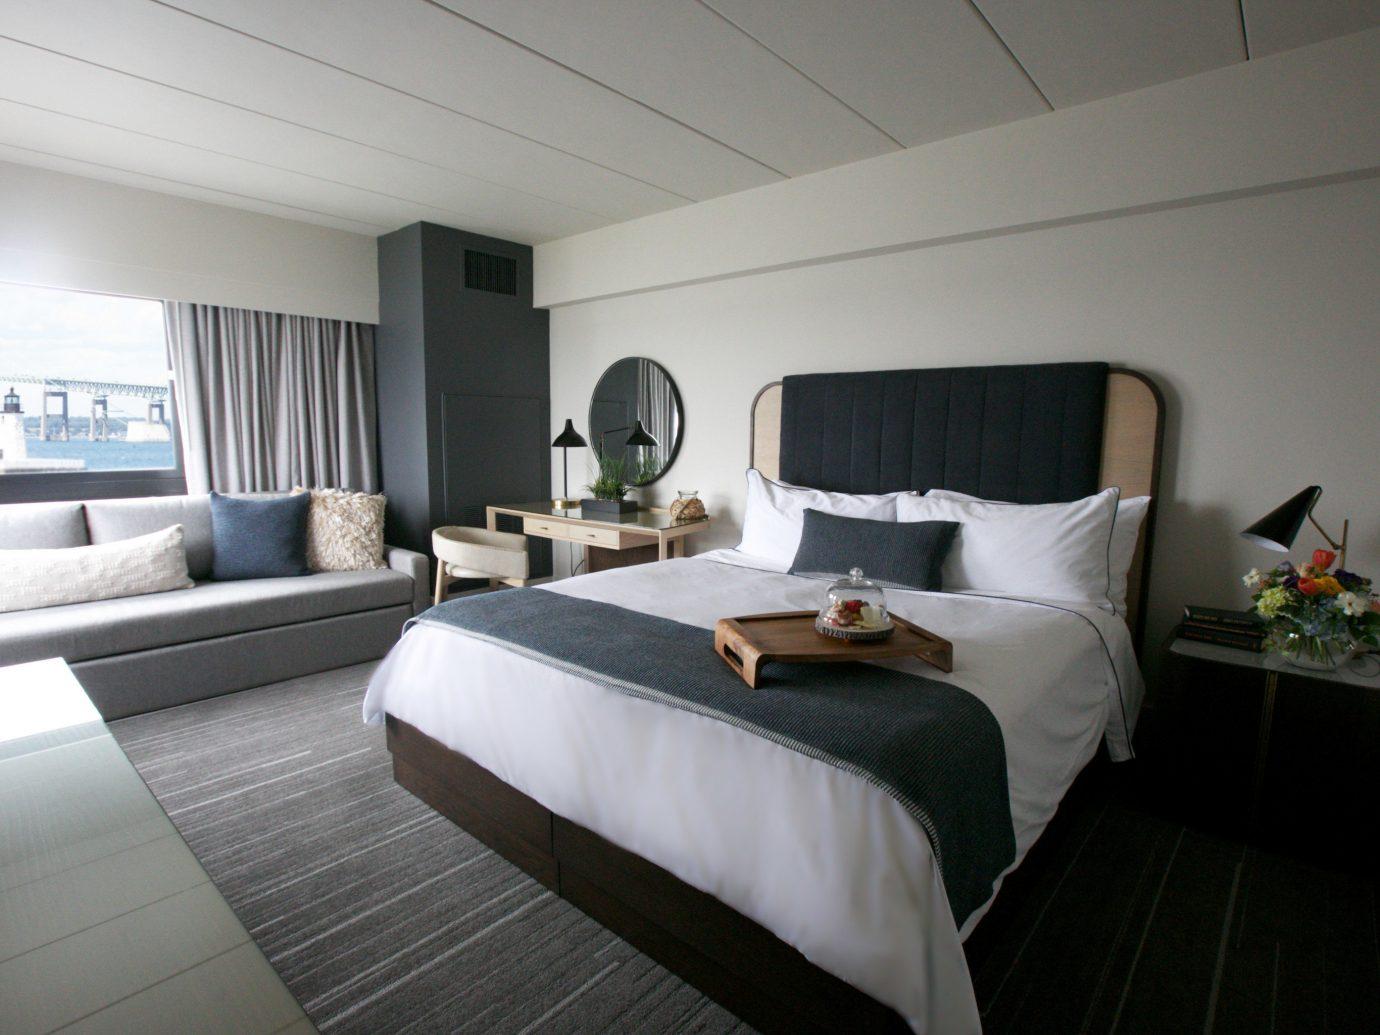 Hotels indoor wall bed ceiling room floor property Bedroom hotel Suite interior design real estate vehicle condominium yacht estate cottage Villa apartment furniture